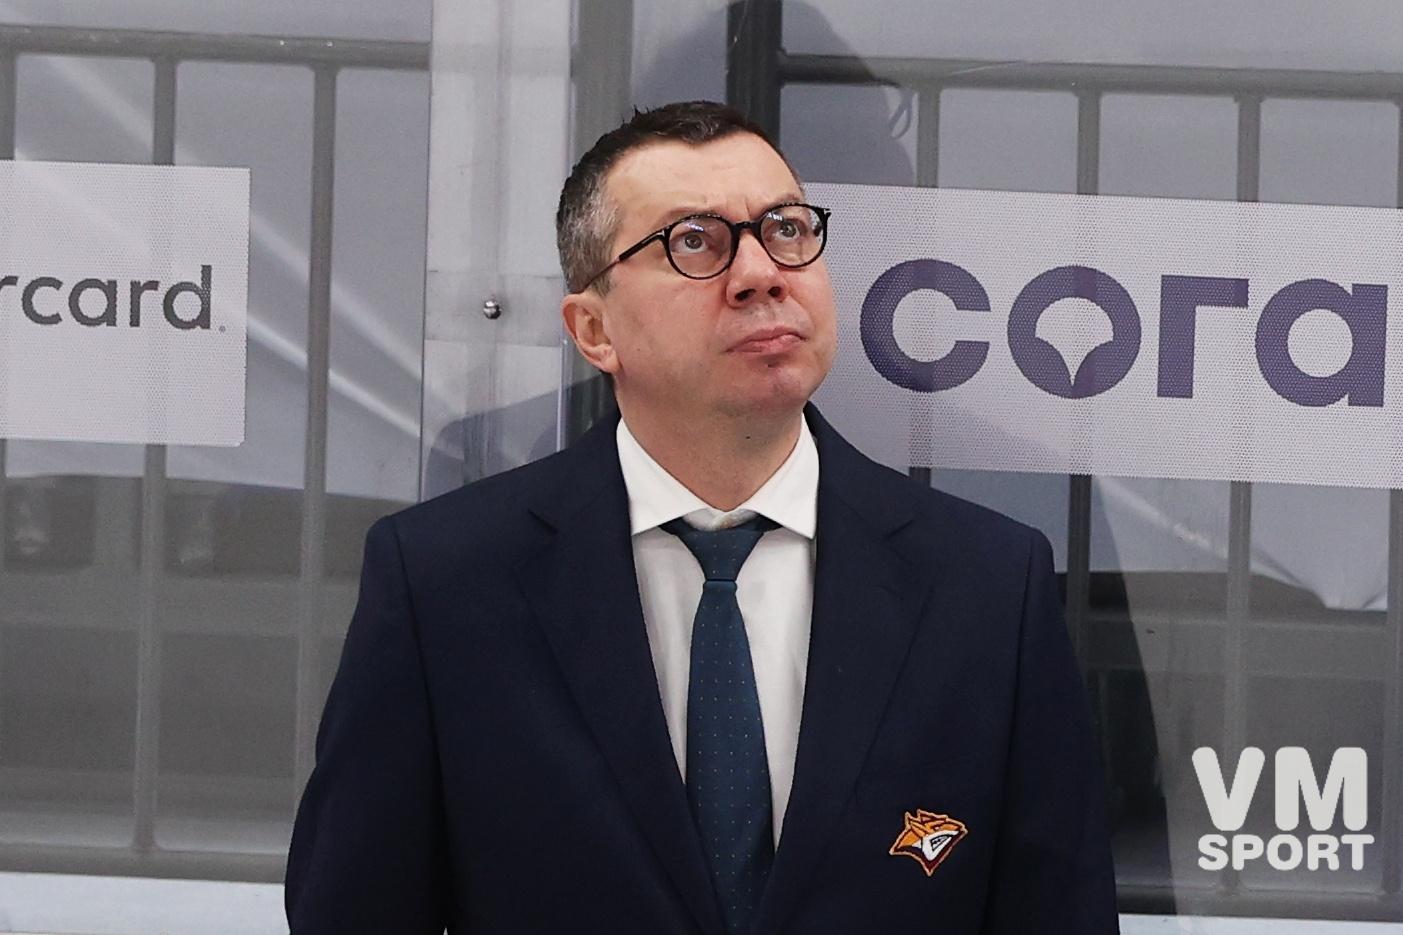 ХК Металлург. Илья Воробьёв